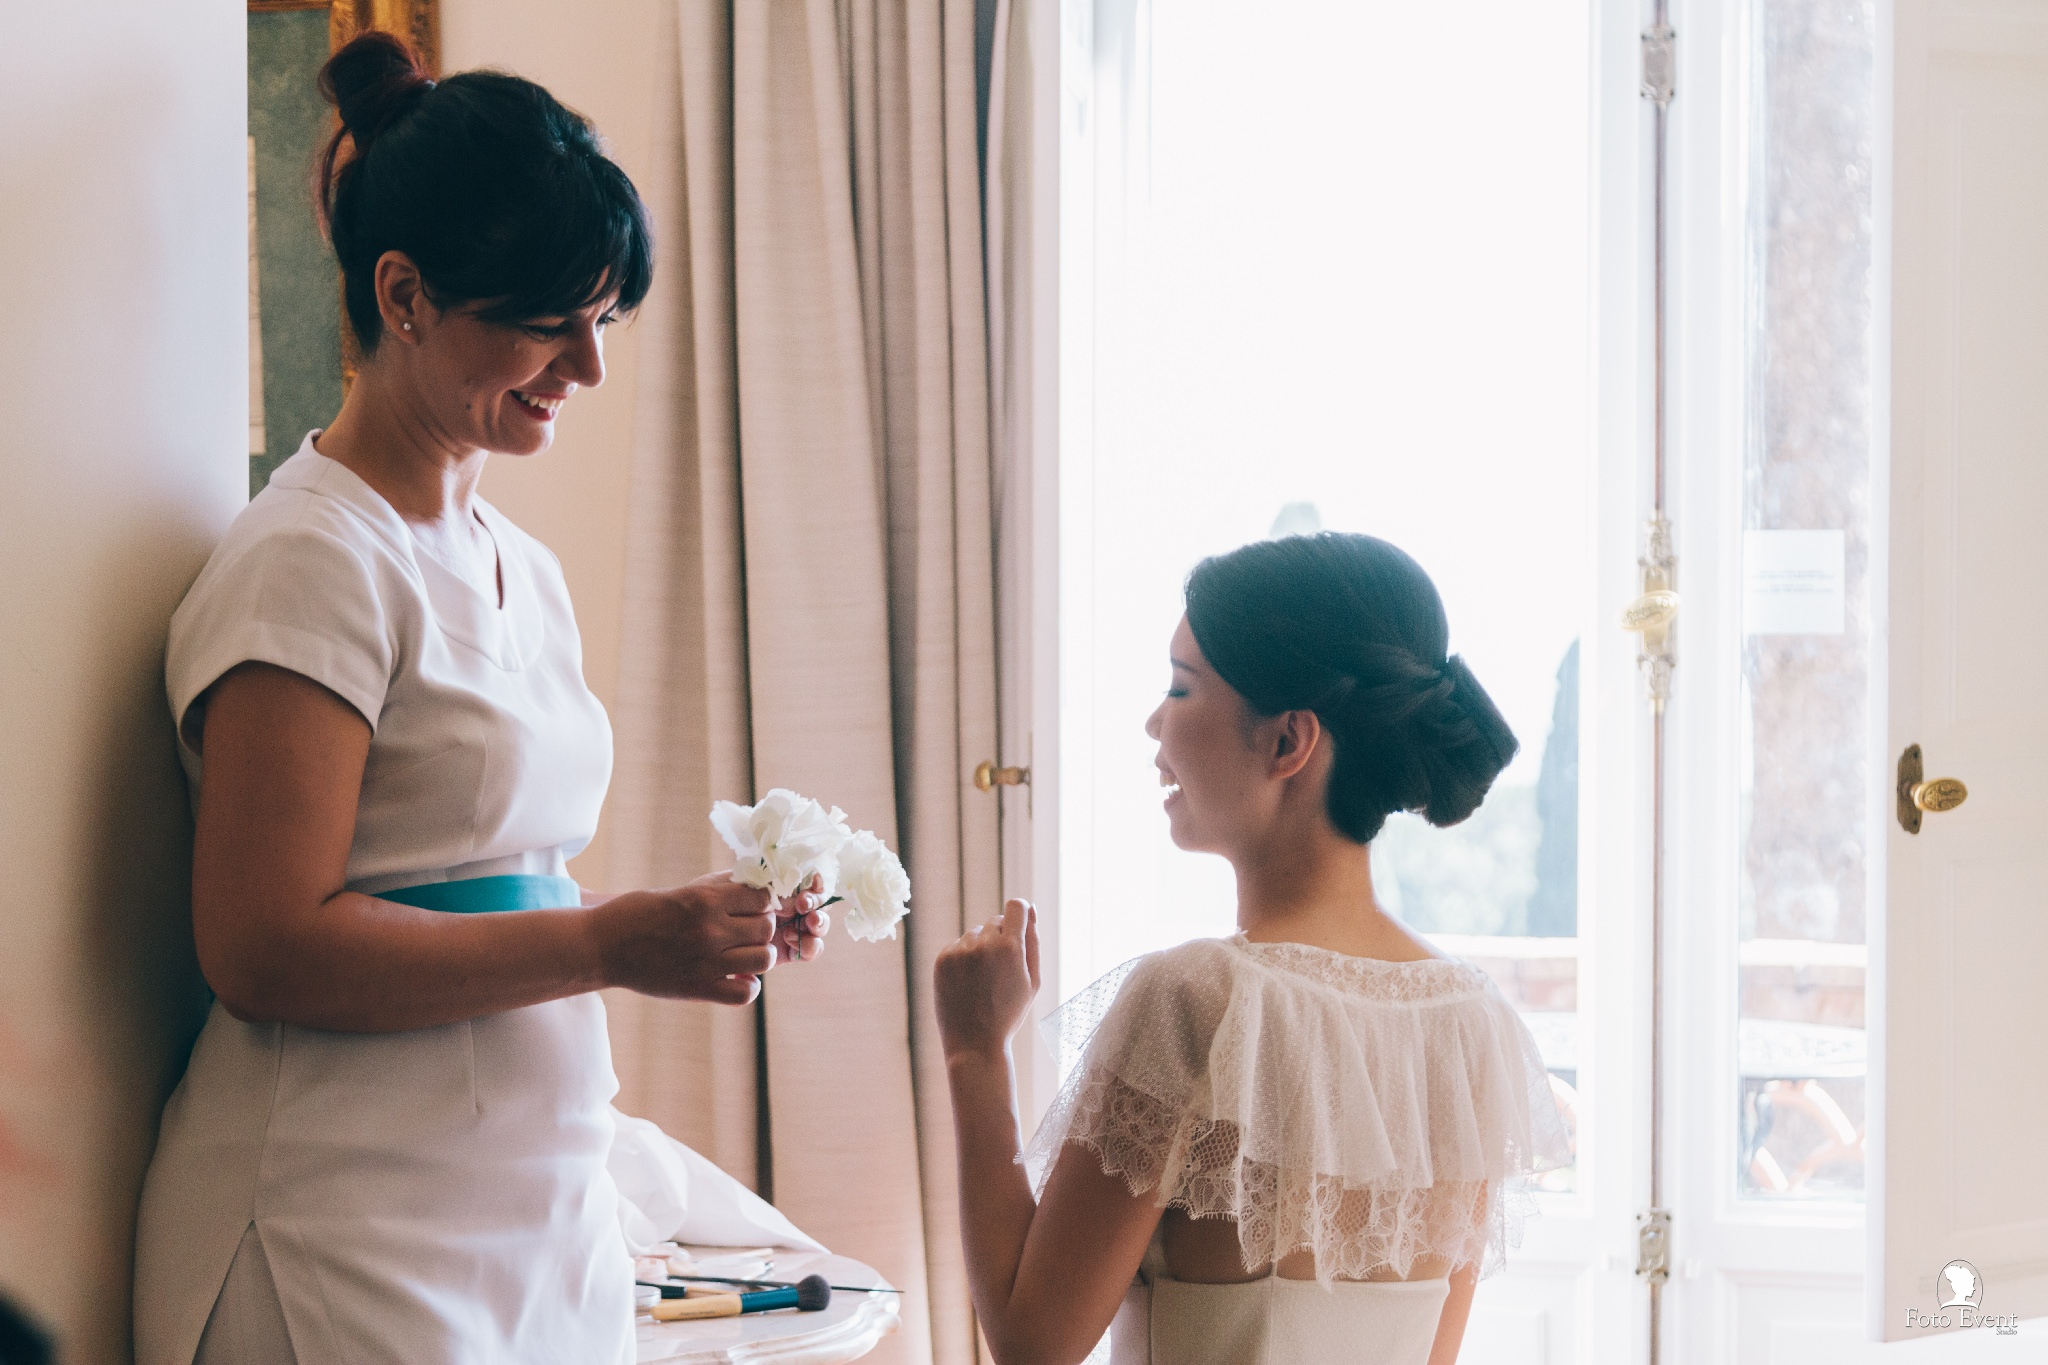 065-2019-06-14-Wedding-Yume-e-Makoto-Isee-7DL-054